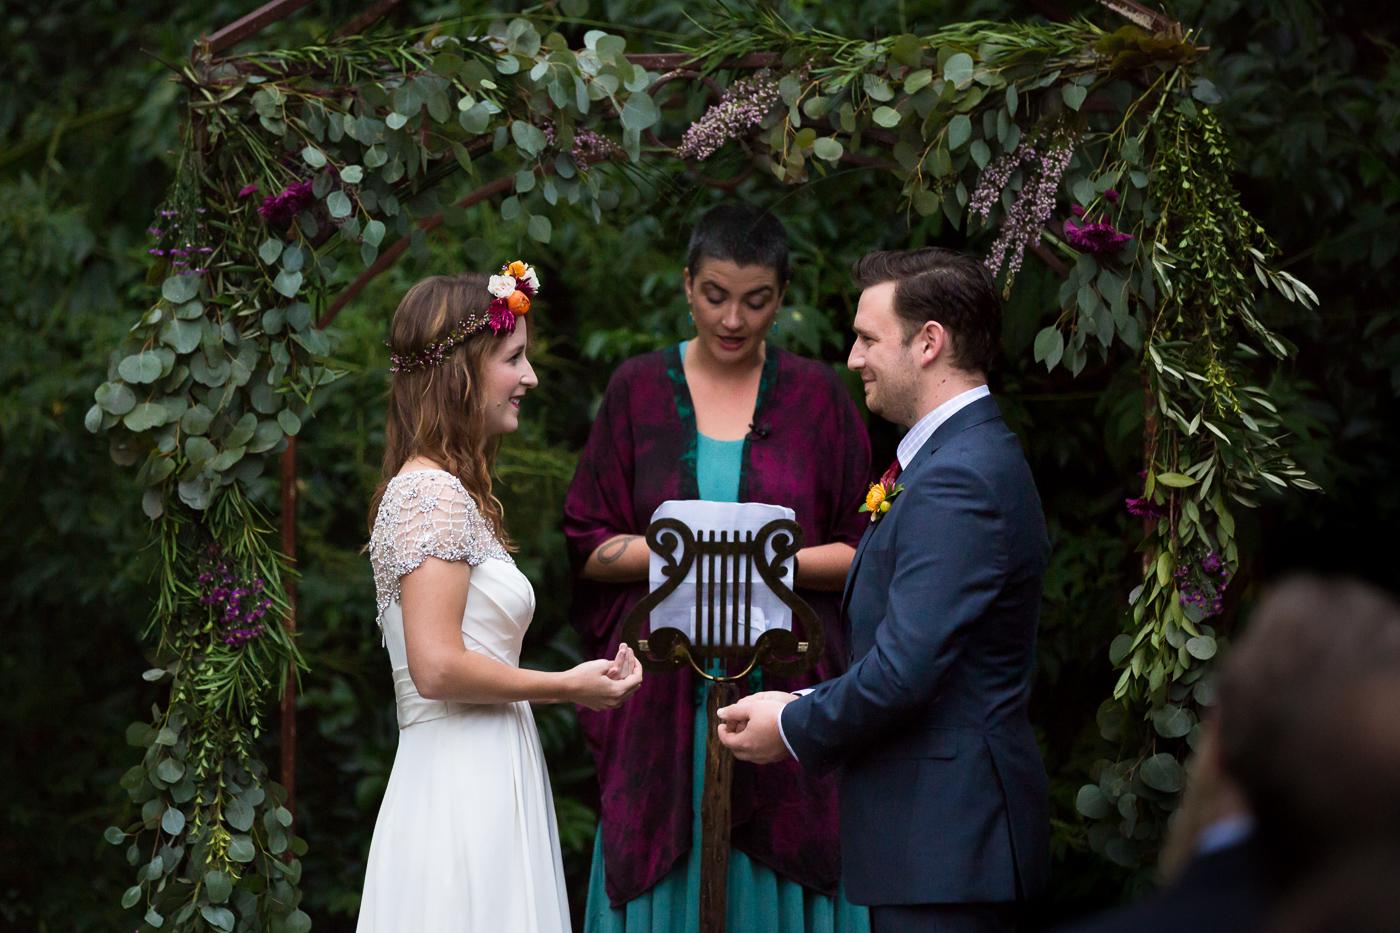 austin-wedding-photographer-videographer-004.jpg